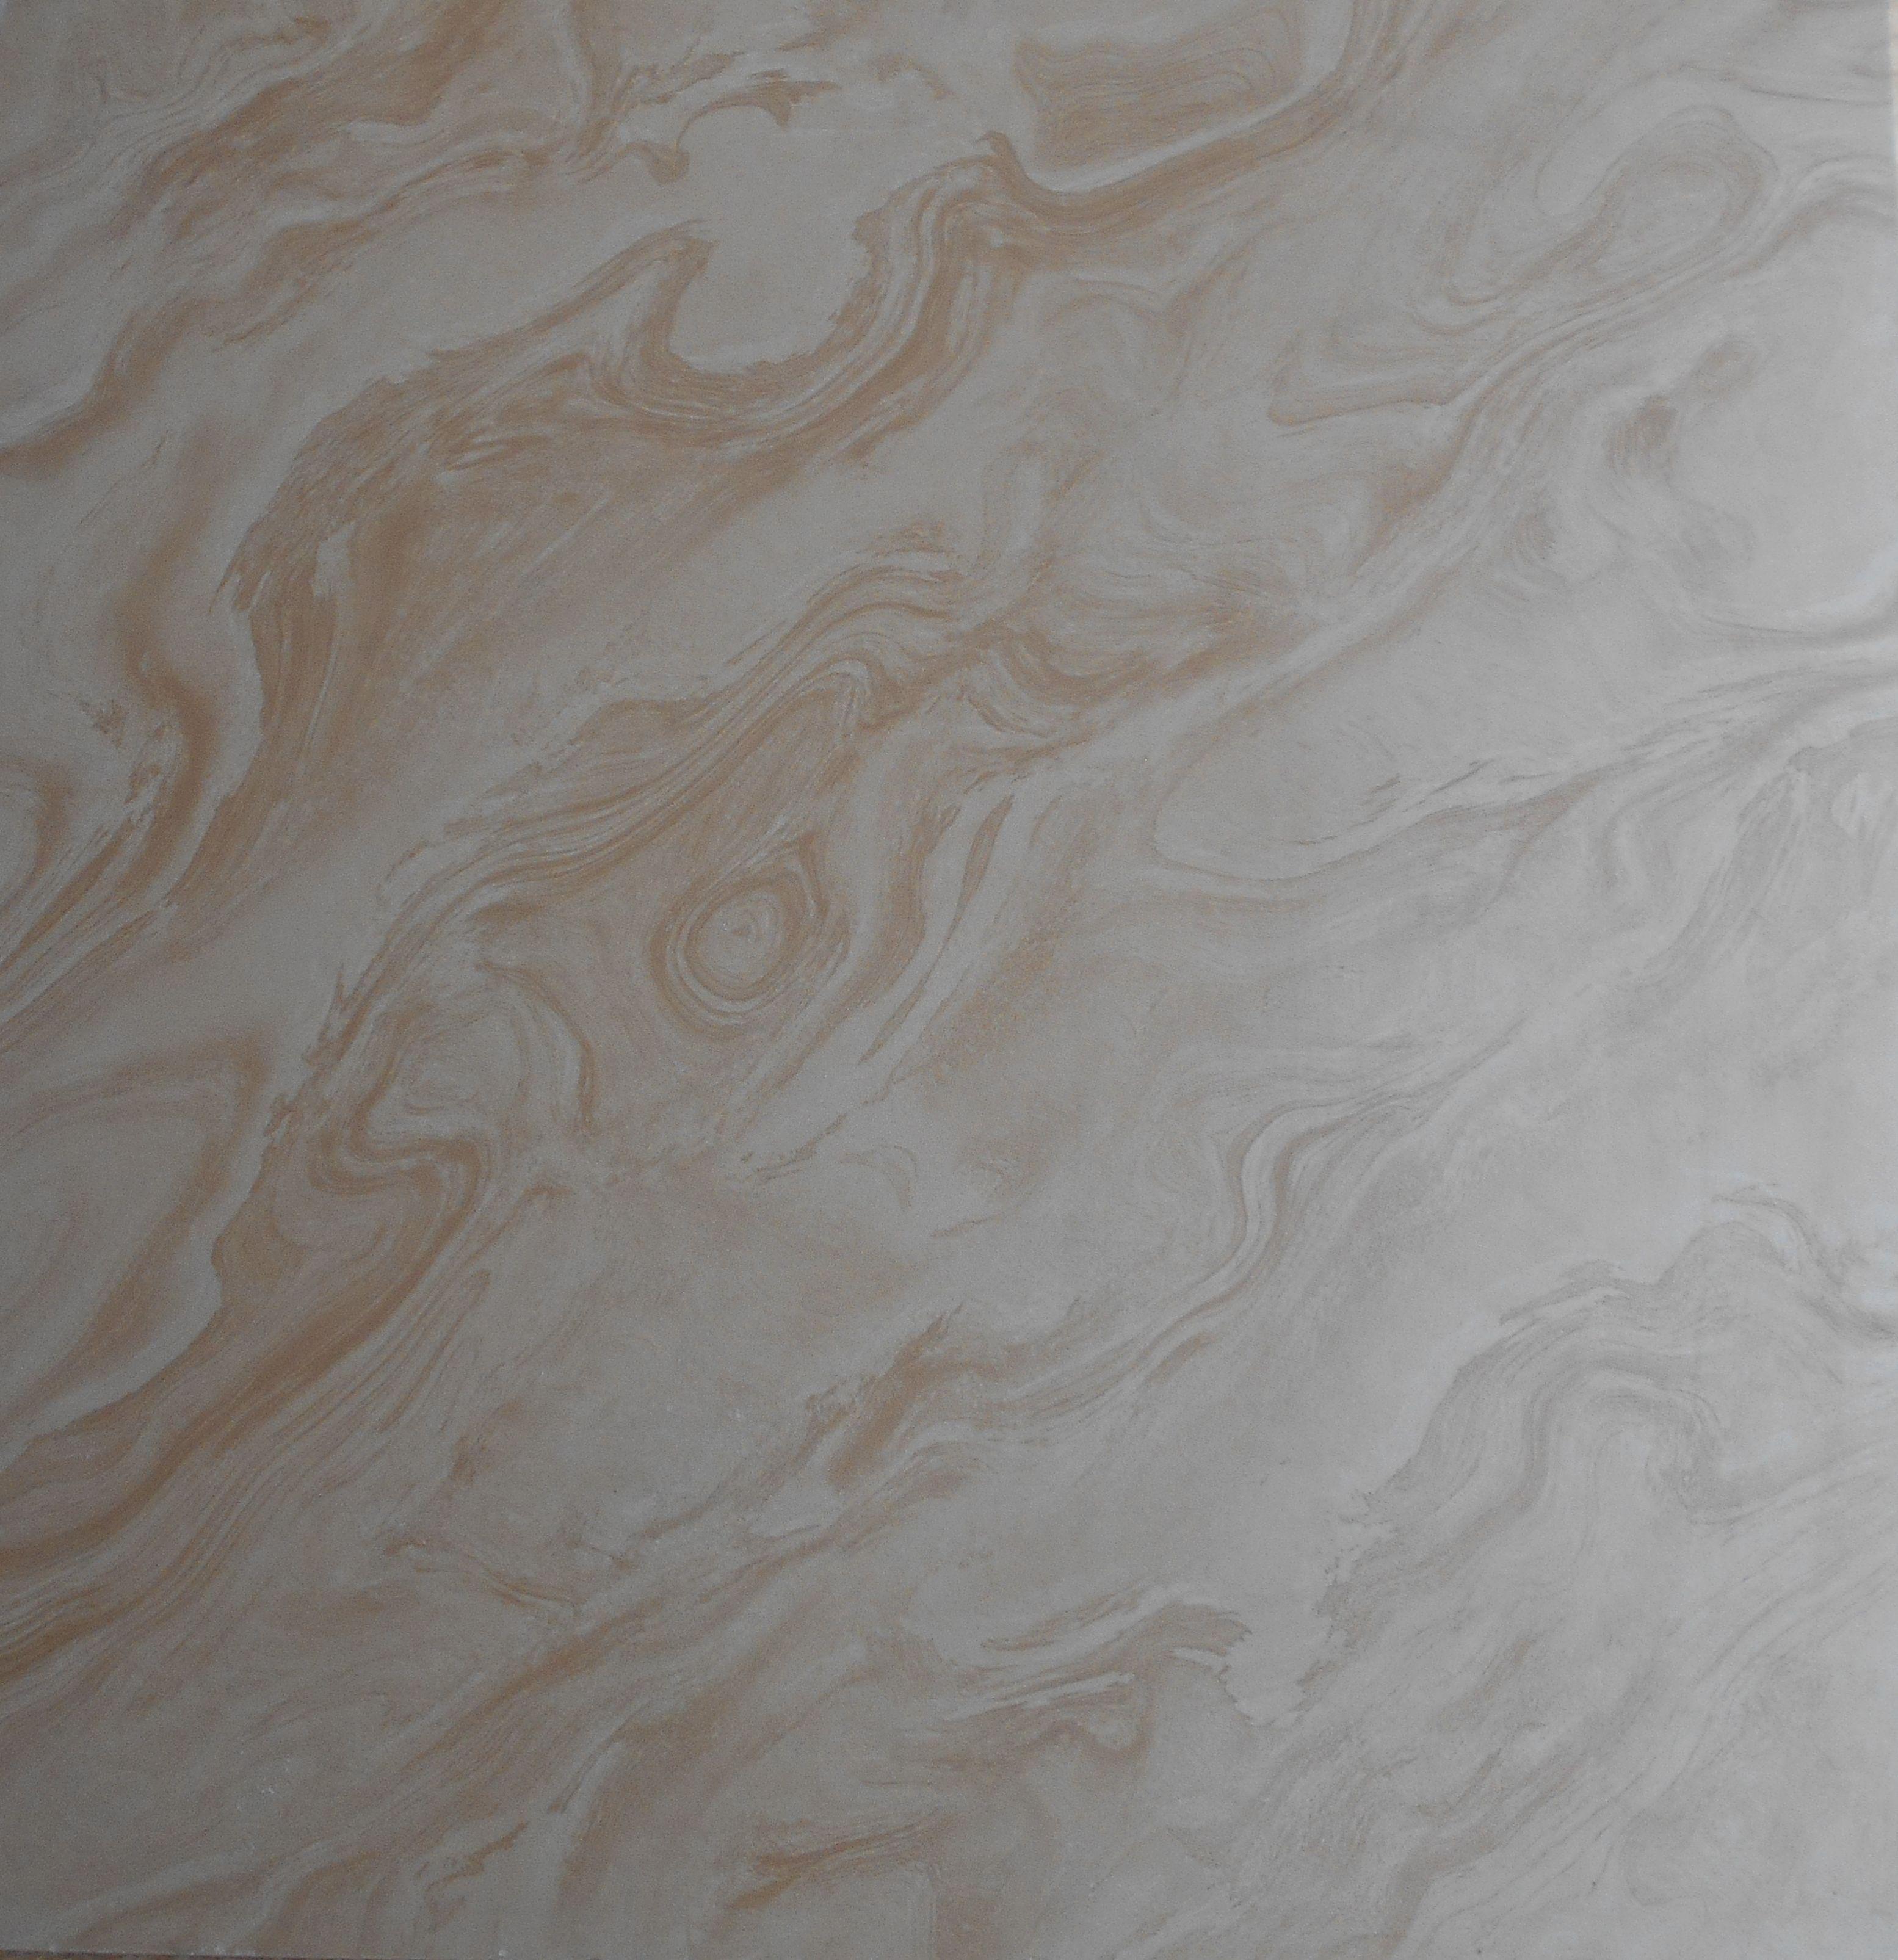 Pin By Wutarick On Floor Tiles Nigeria Flooring Grey Flooring Tile Floor